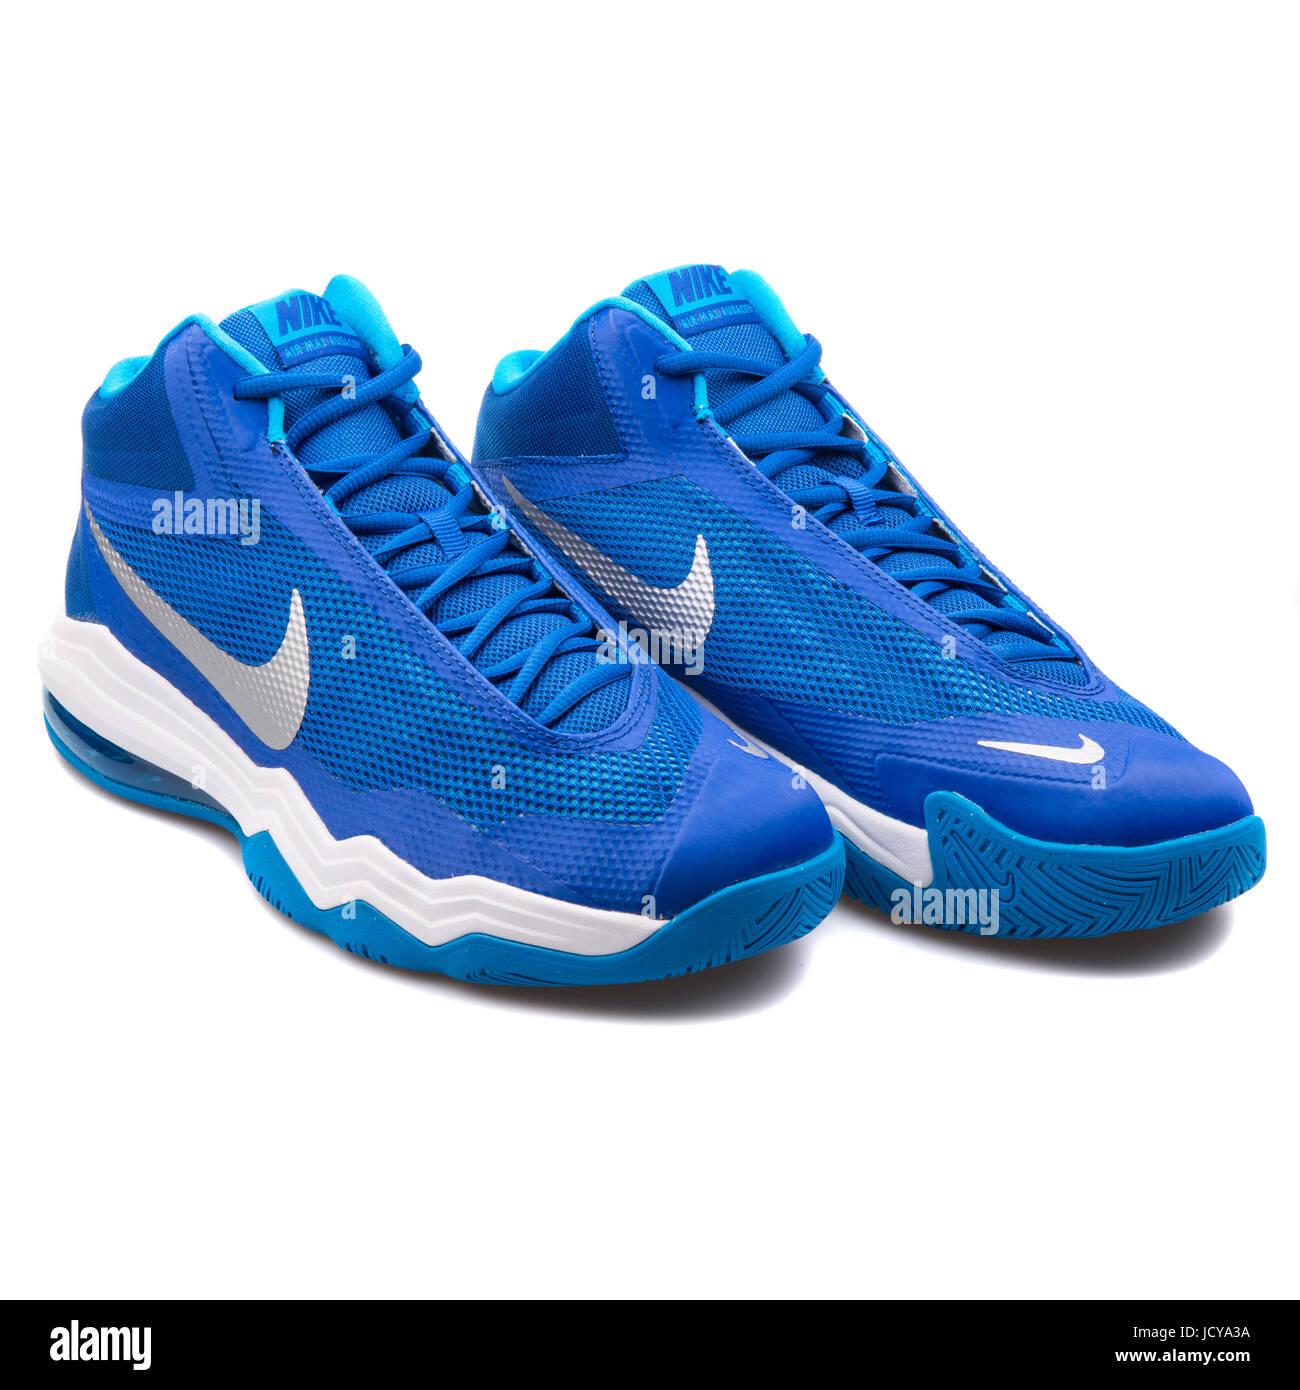 Unisex Air Max Audacity Basketball Nike blau und TB weiß rCBoxed